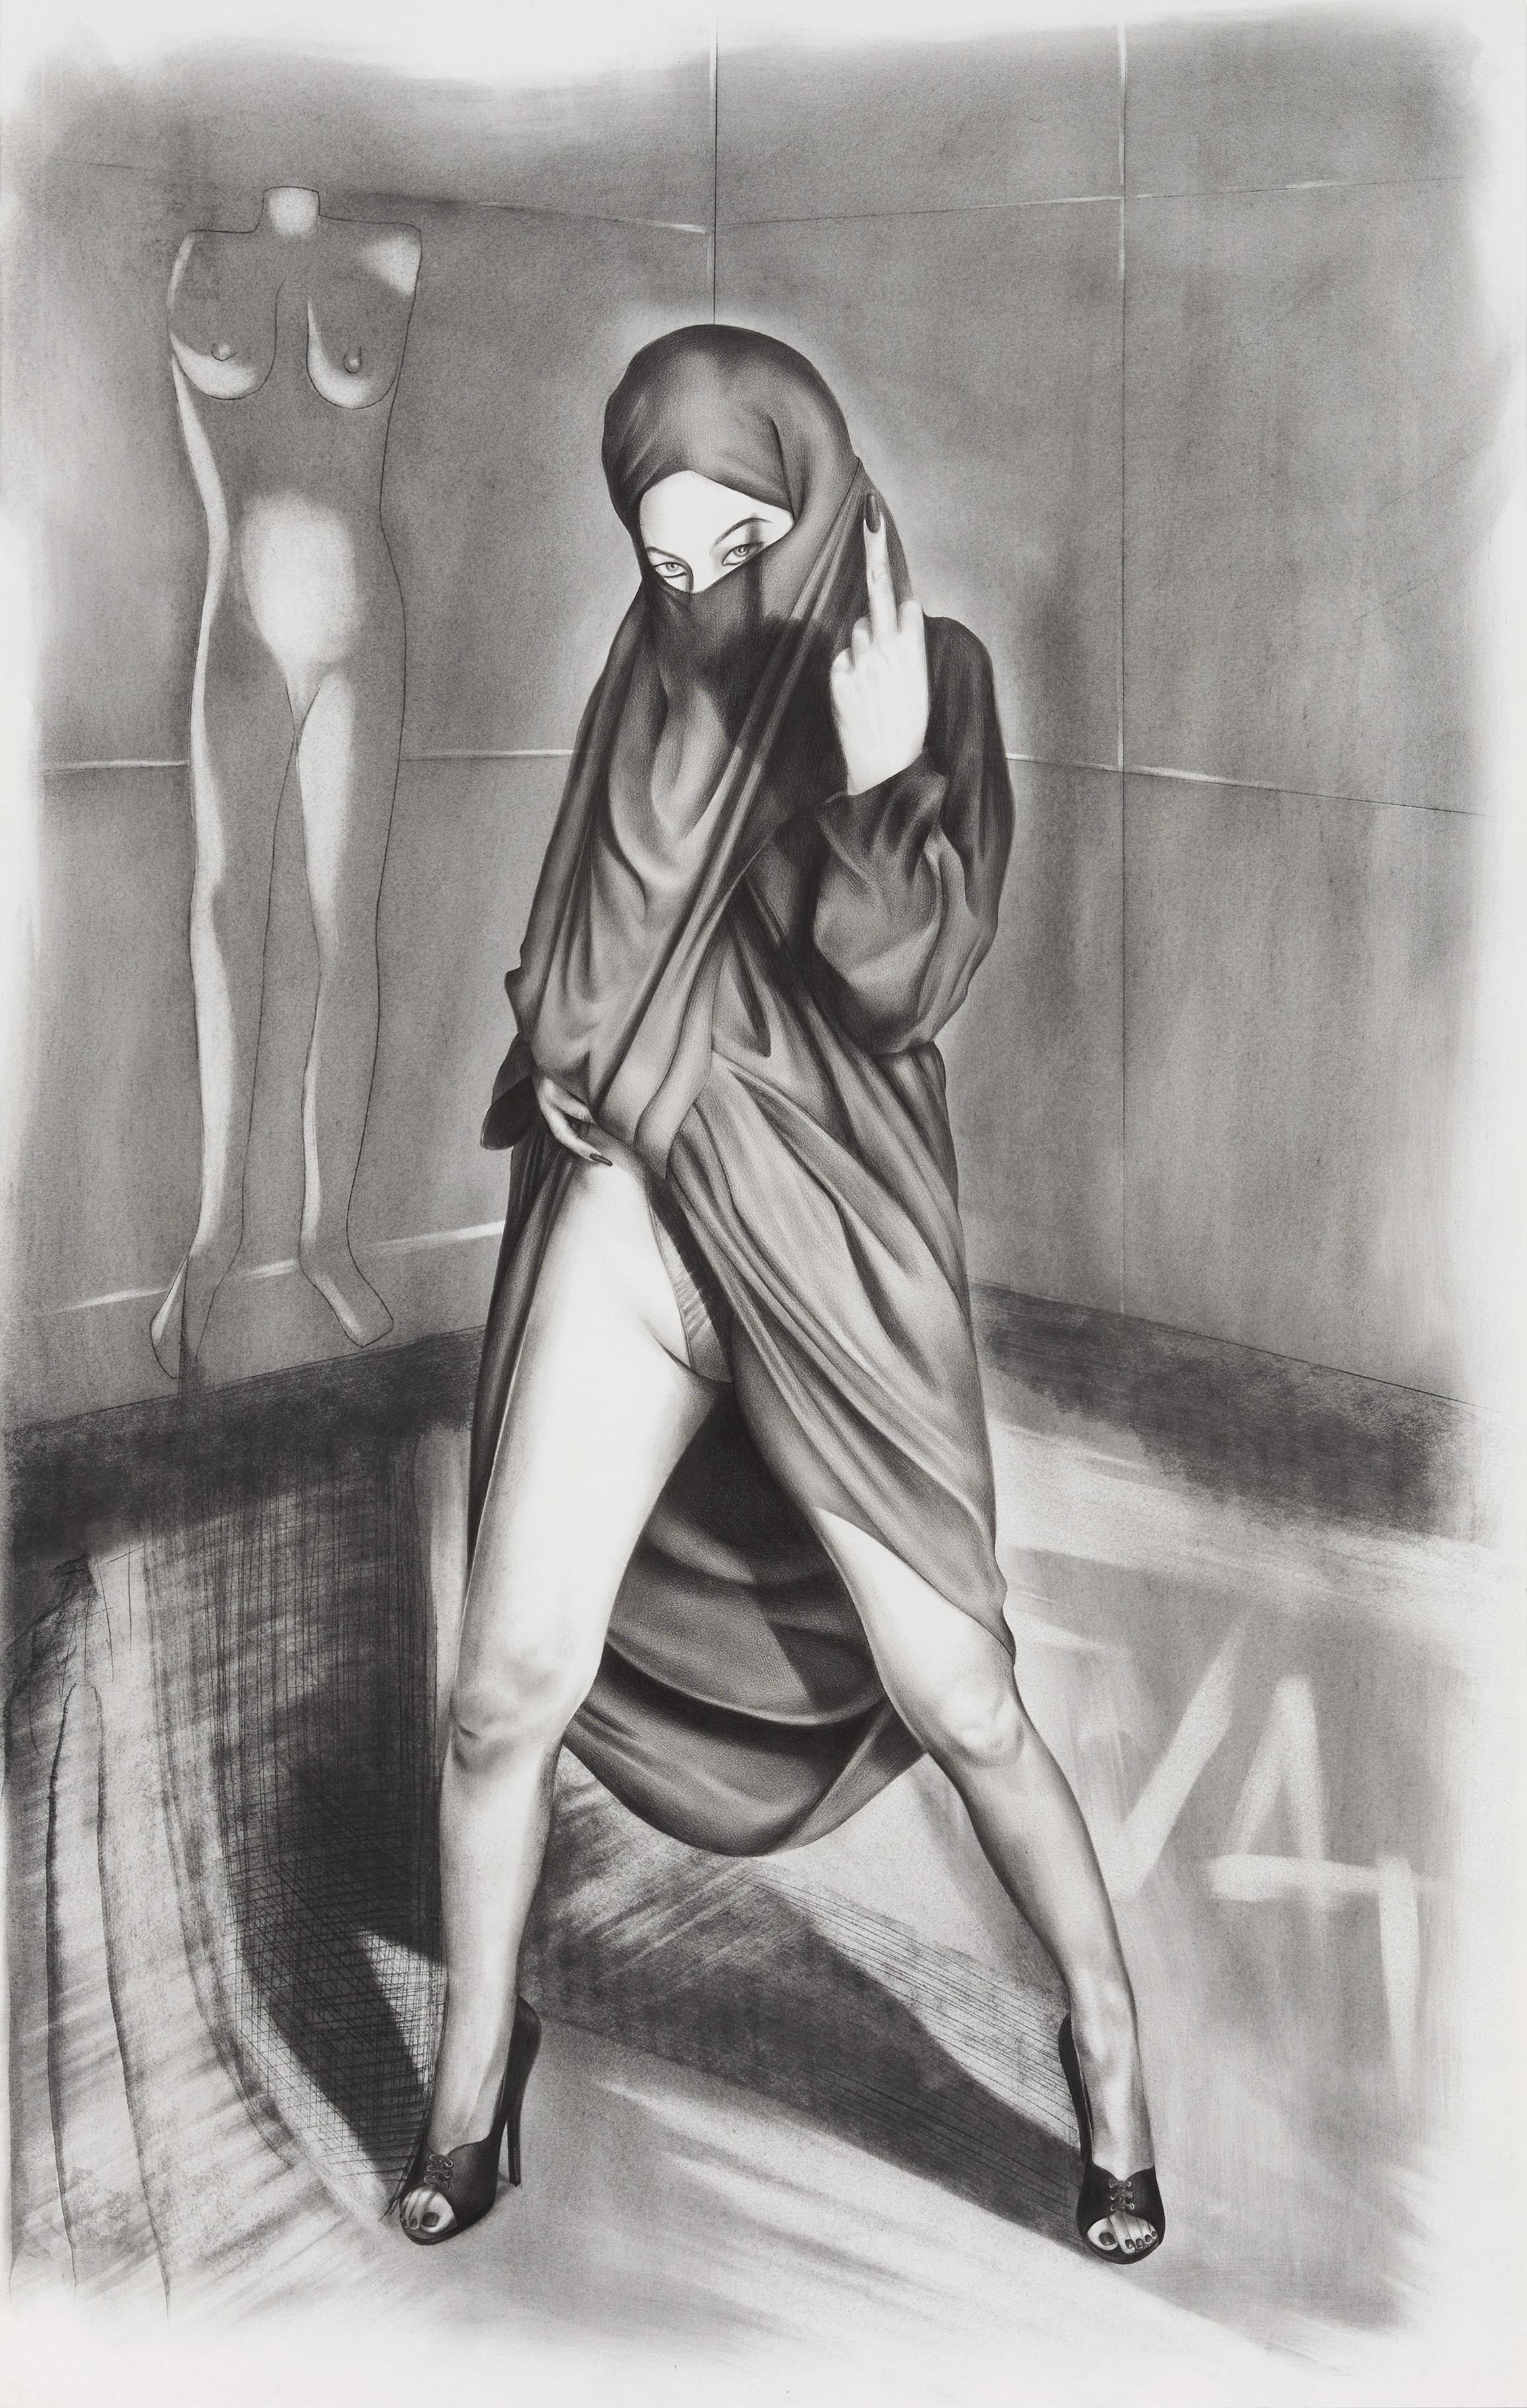 Taravat Talepasand  Blasphemy X , 2016 graphite on paper 22h x 15w in.